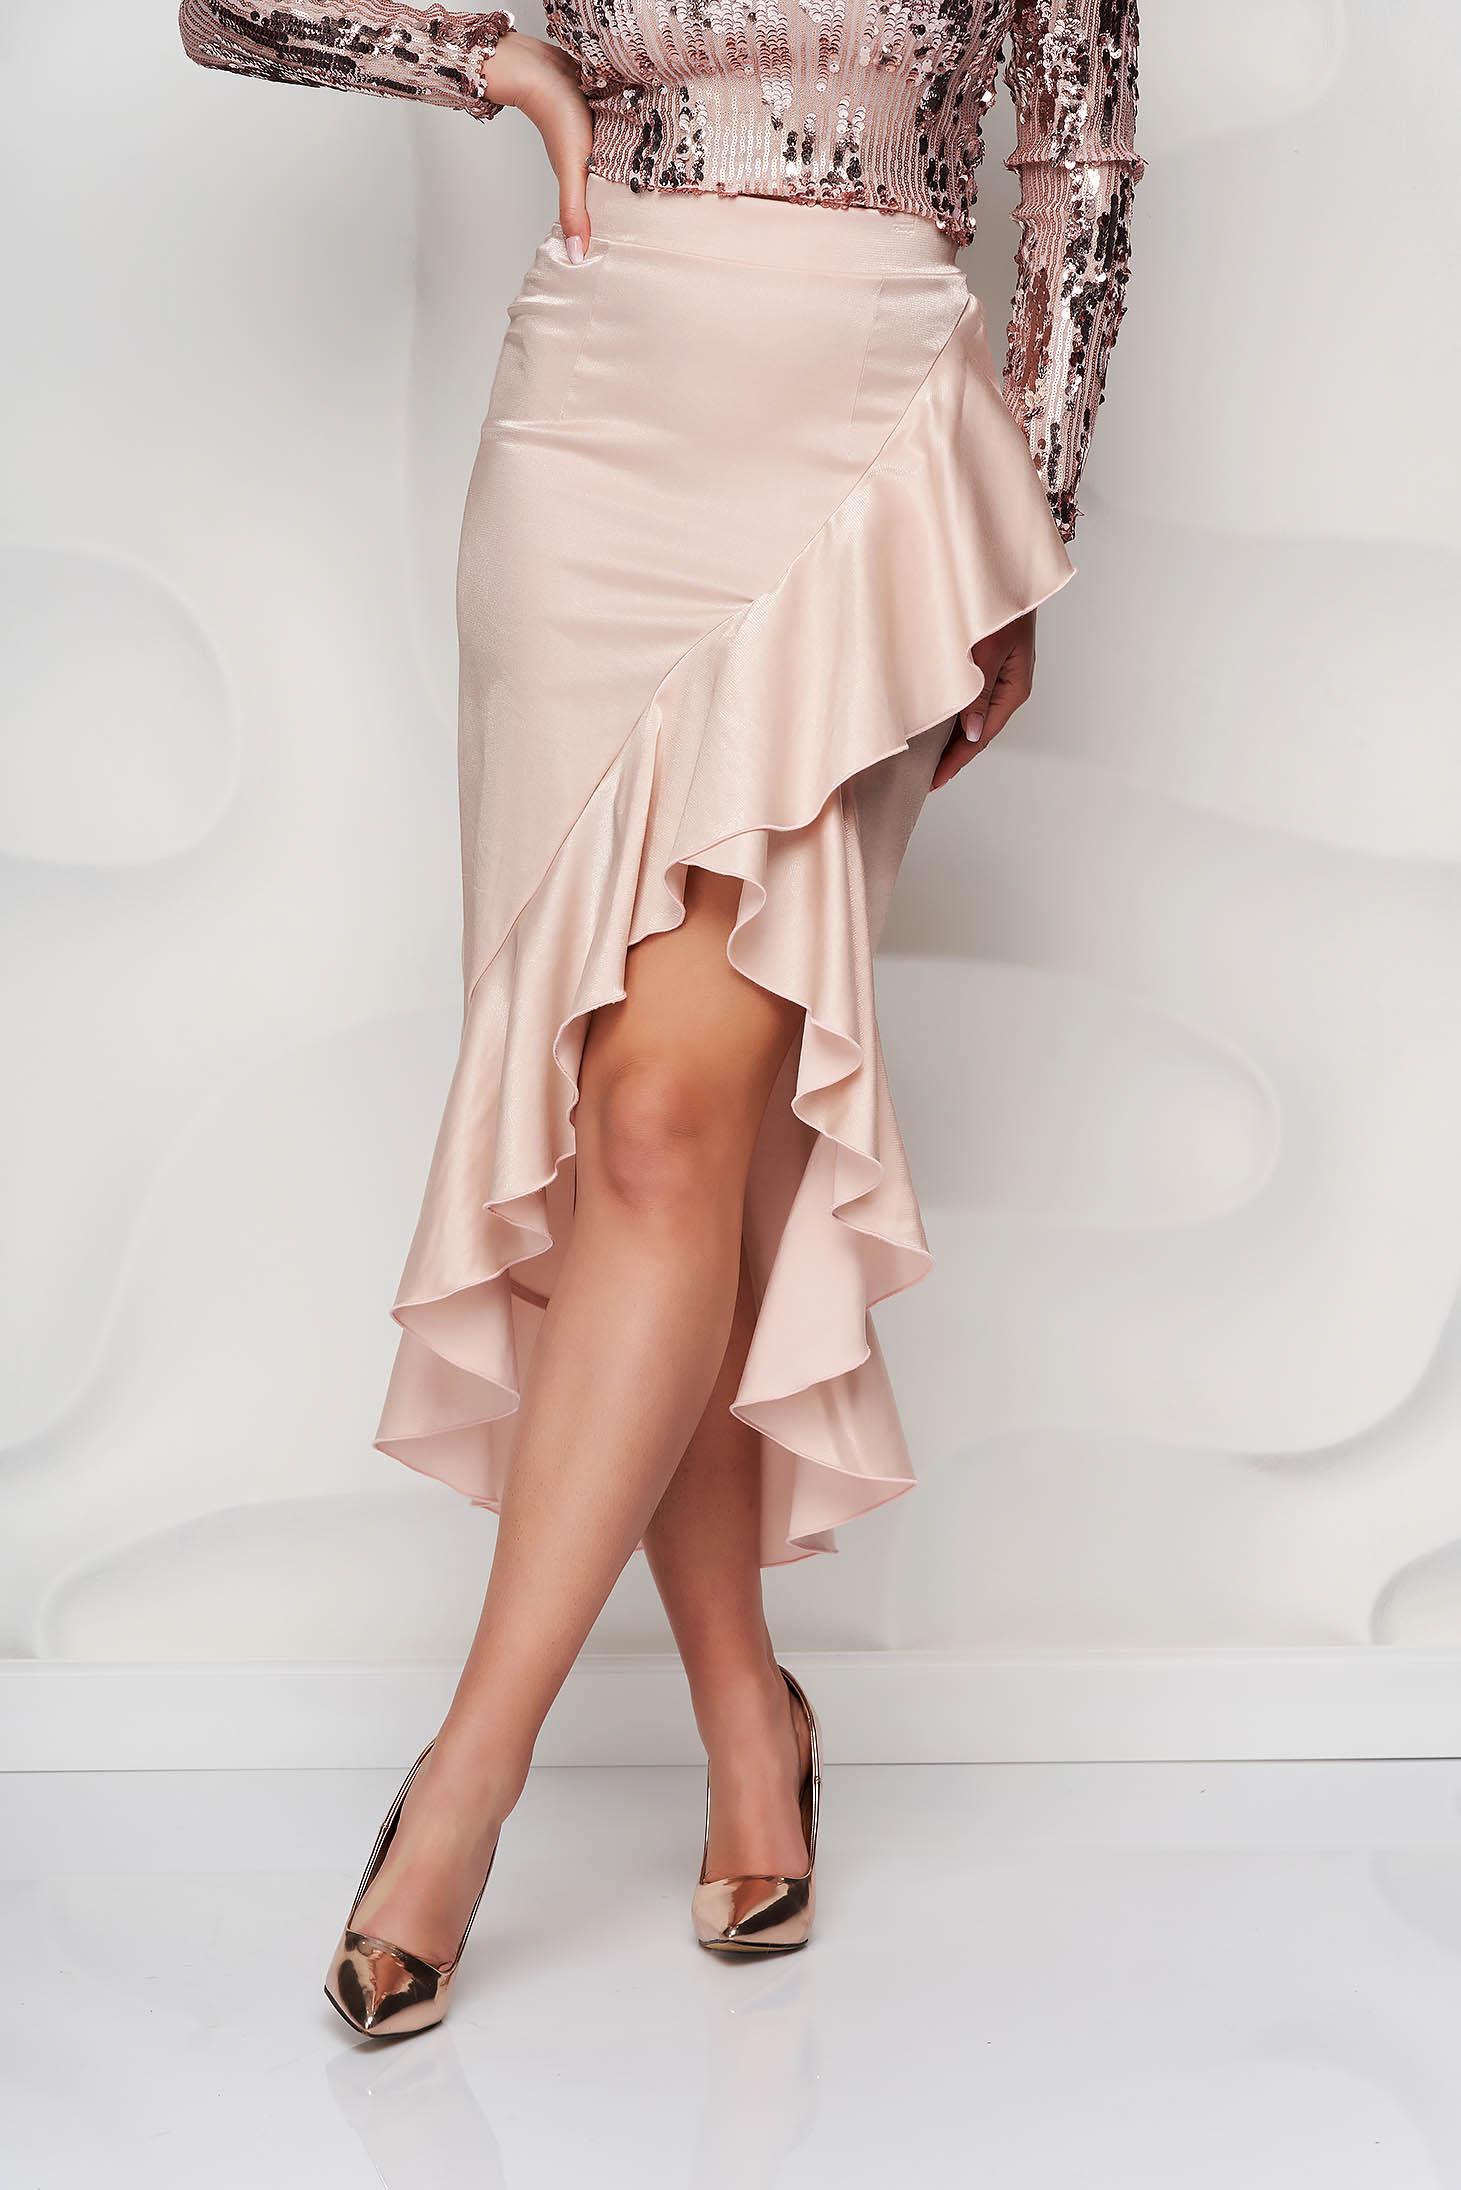 StarShinerS lightpink skirt from satin fabric texture elegant asymmetrical